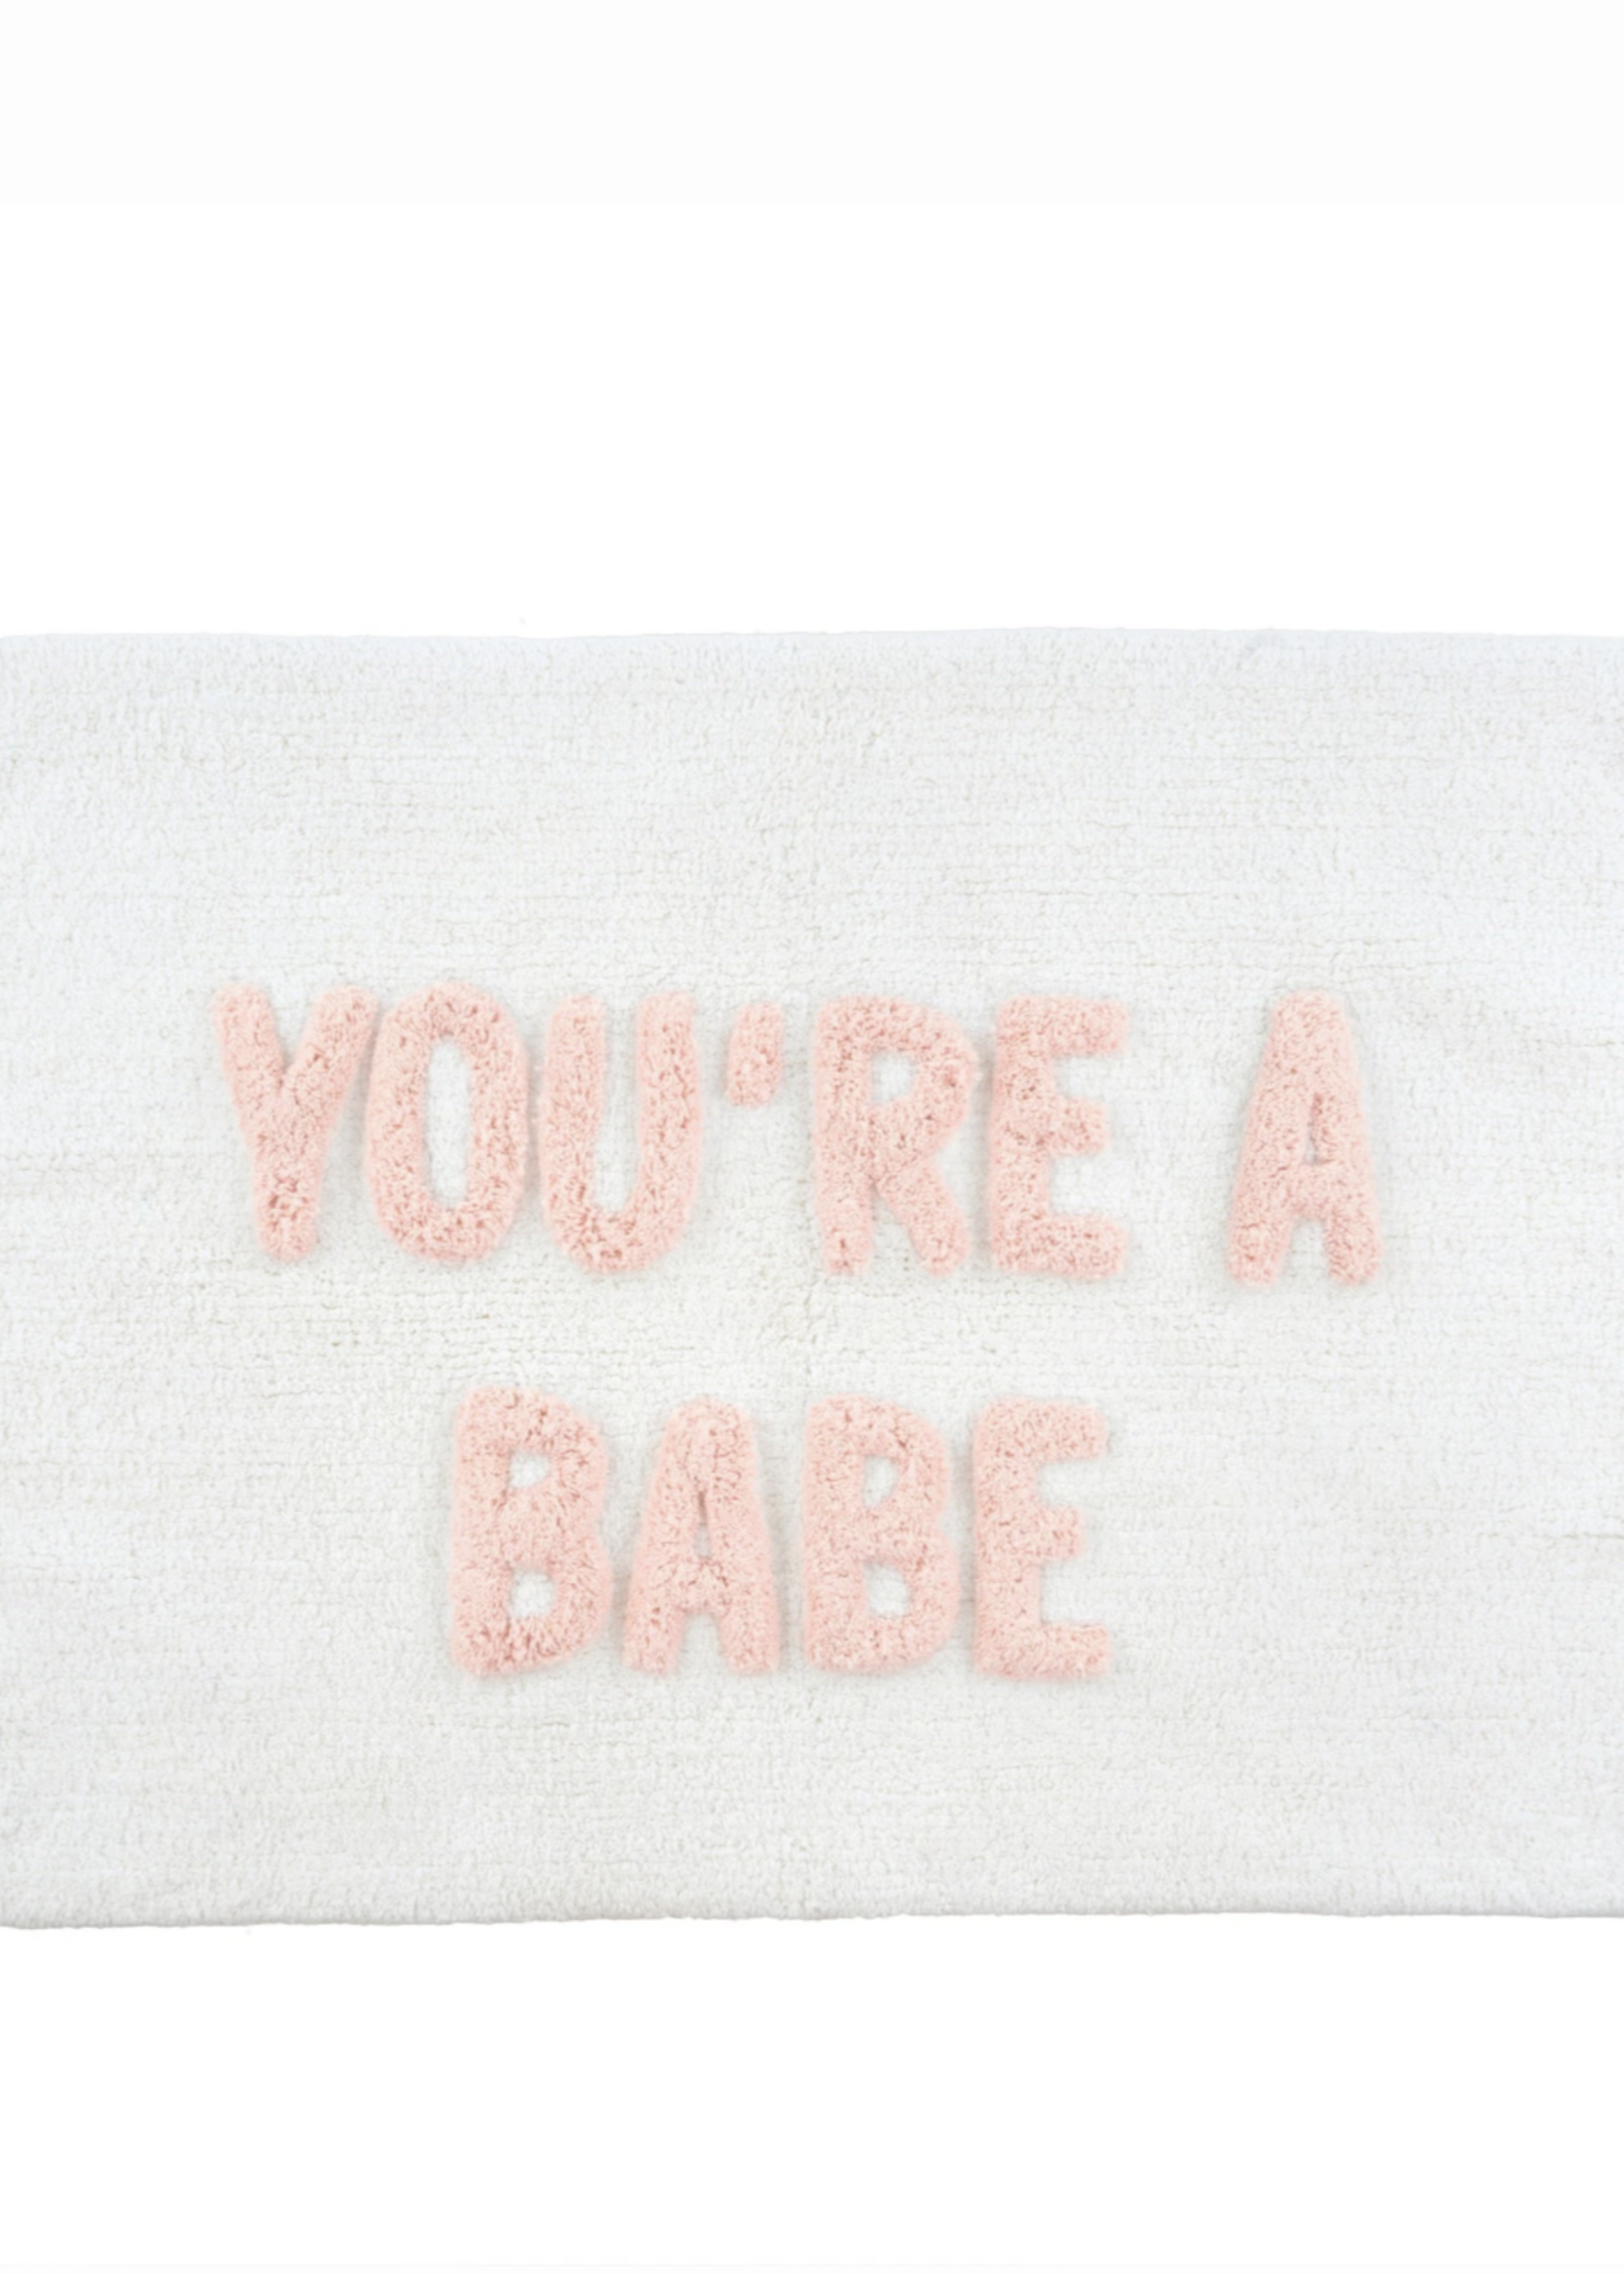 Indaba Trading Co You're A Babe Bathmat